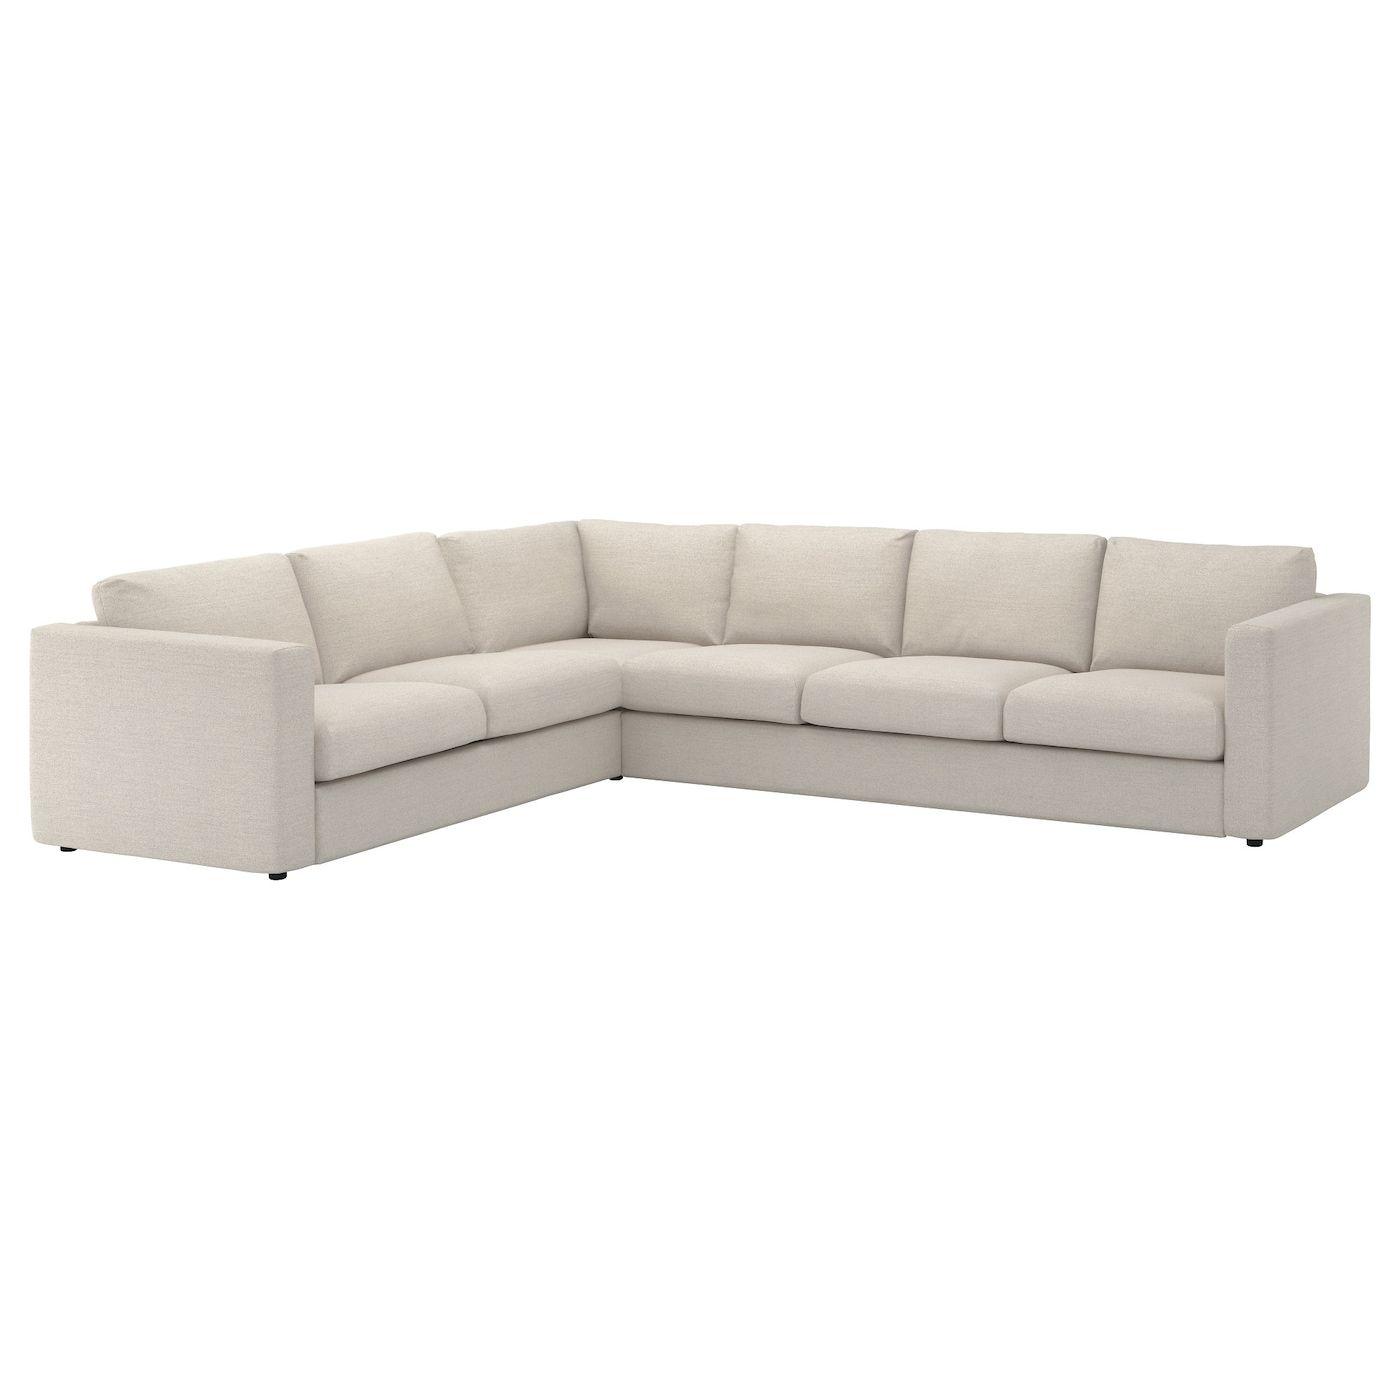 Ikea Us Furniture And Home Furnishings Modular Corner Sofa Ikea Vimle Fabric Sofa